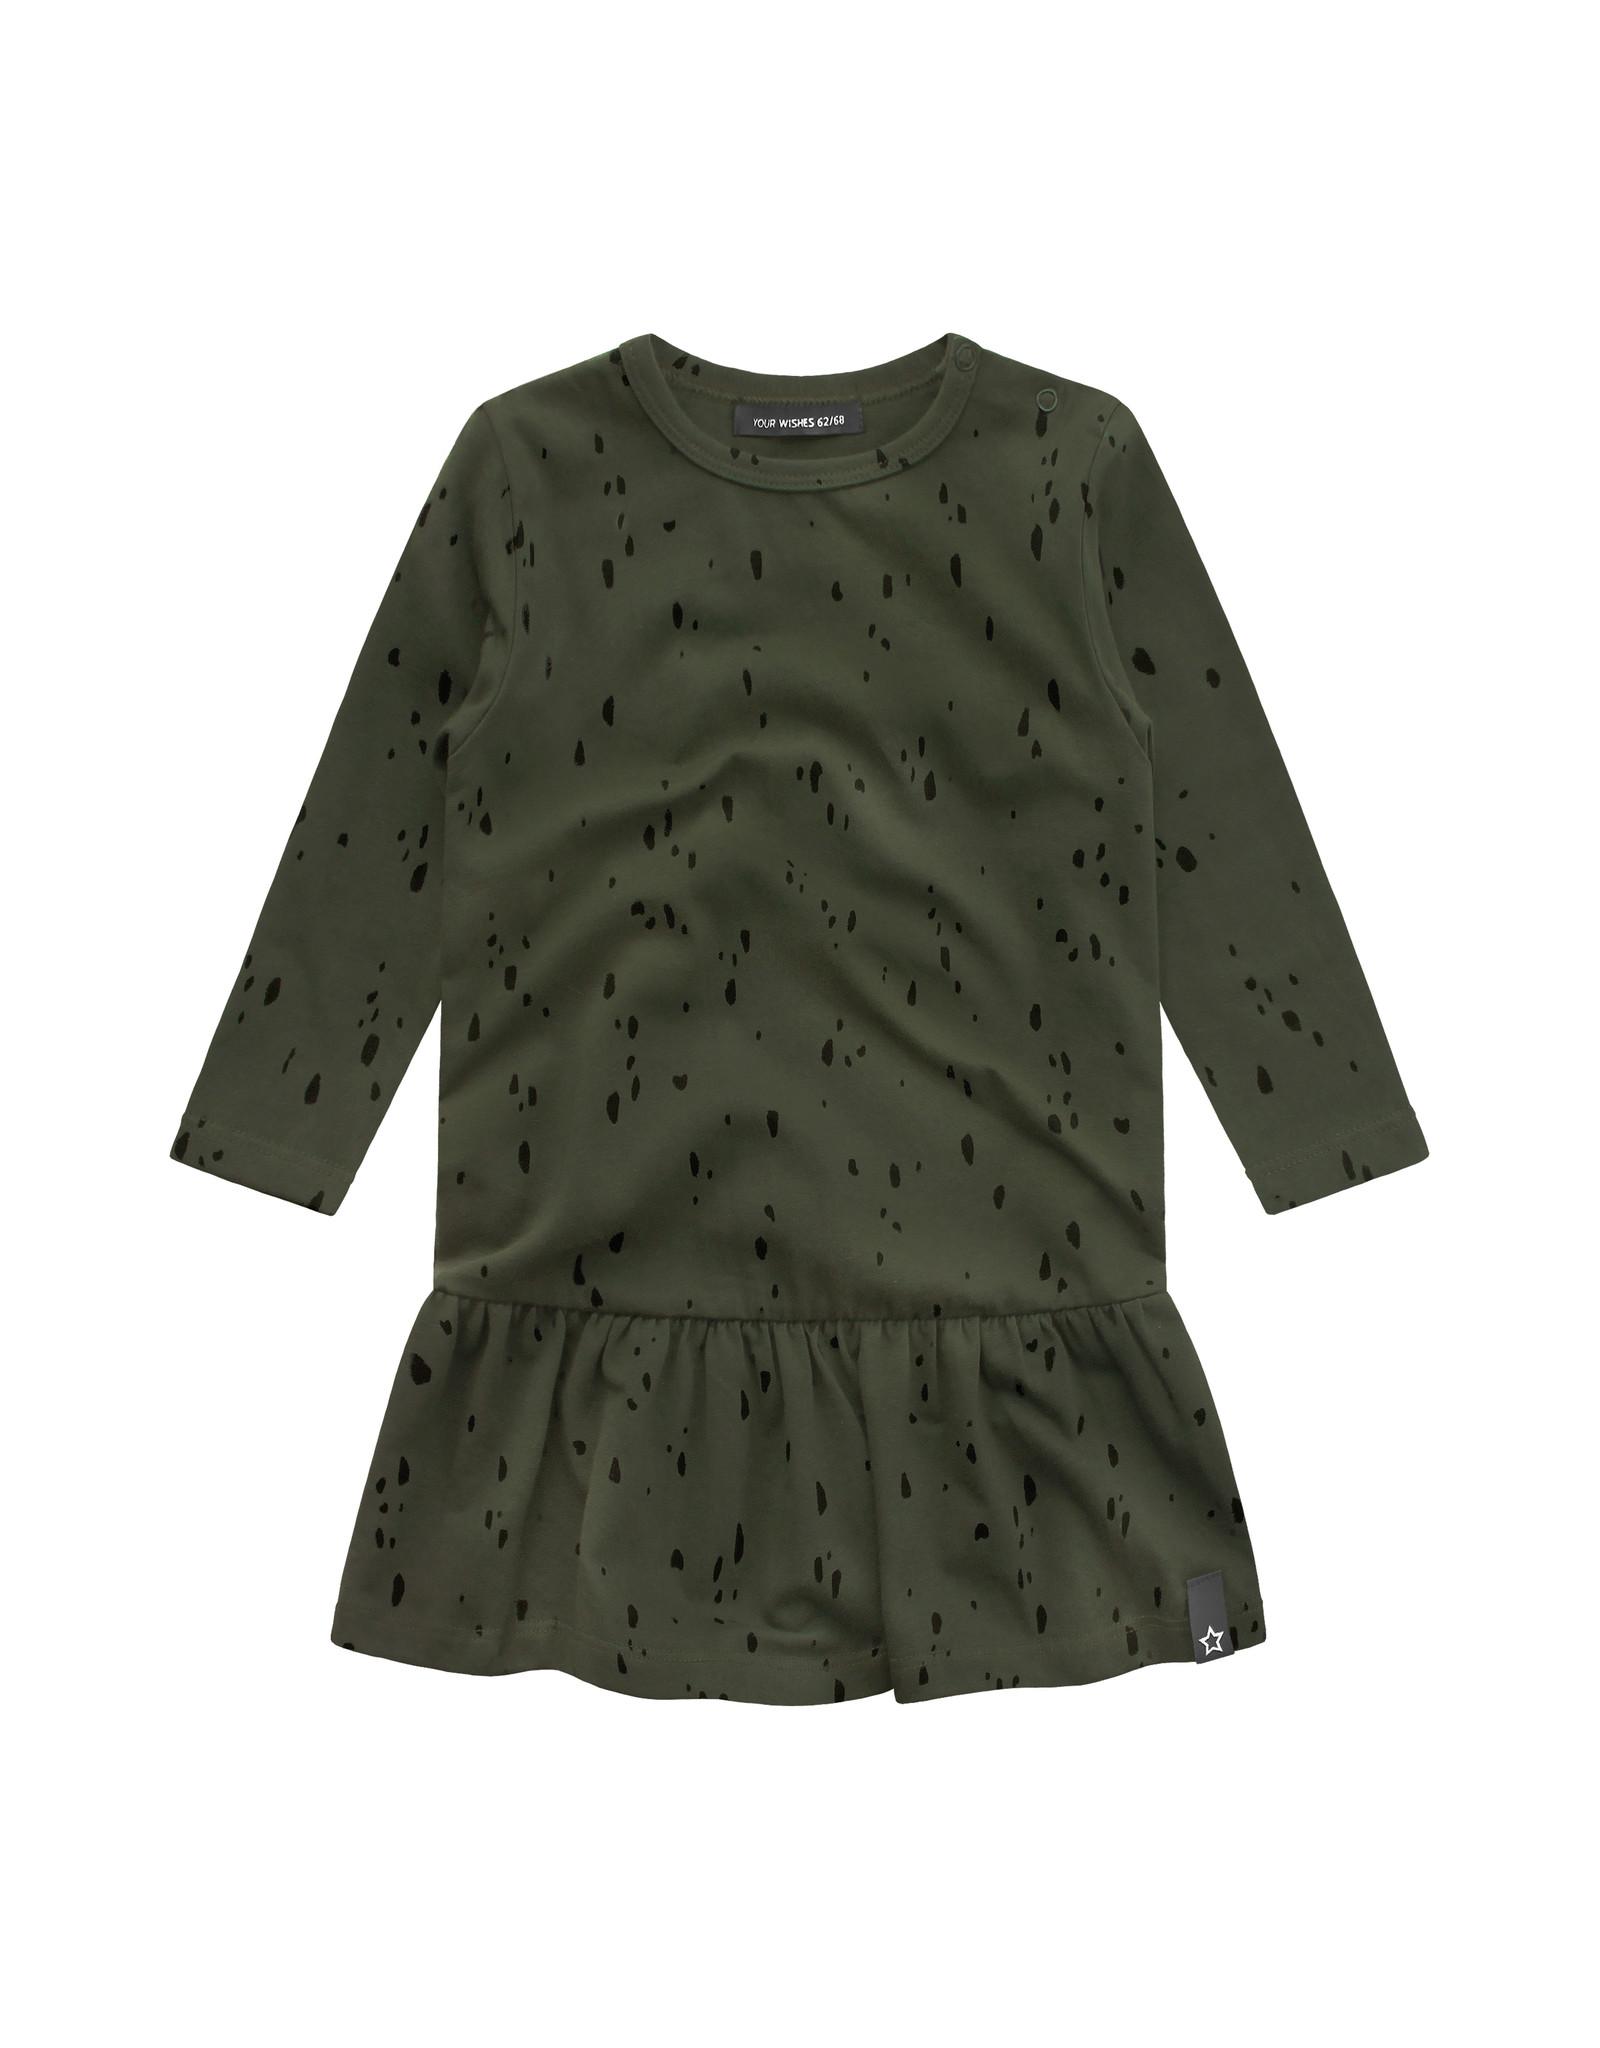 Your Wishes Splatters   Shift Dress, Desk Green